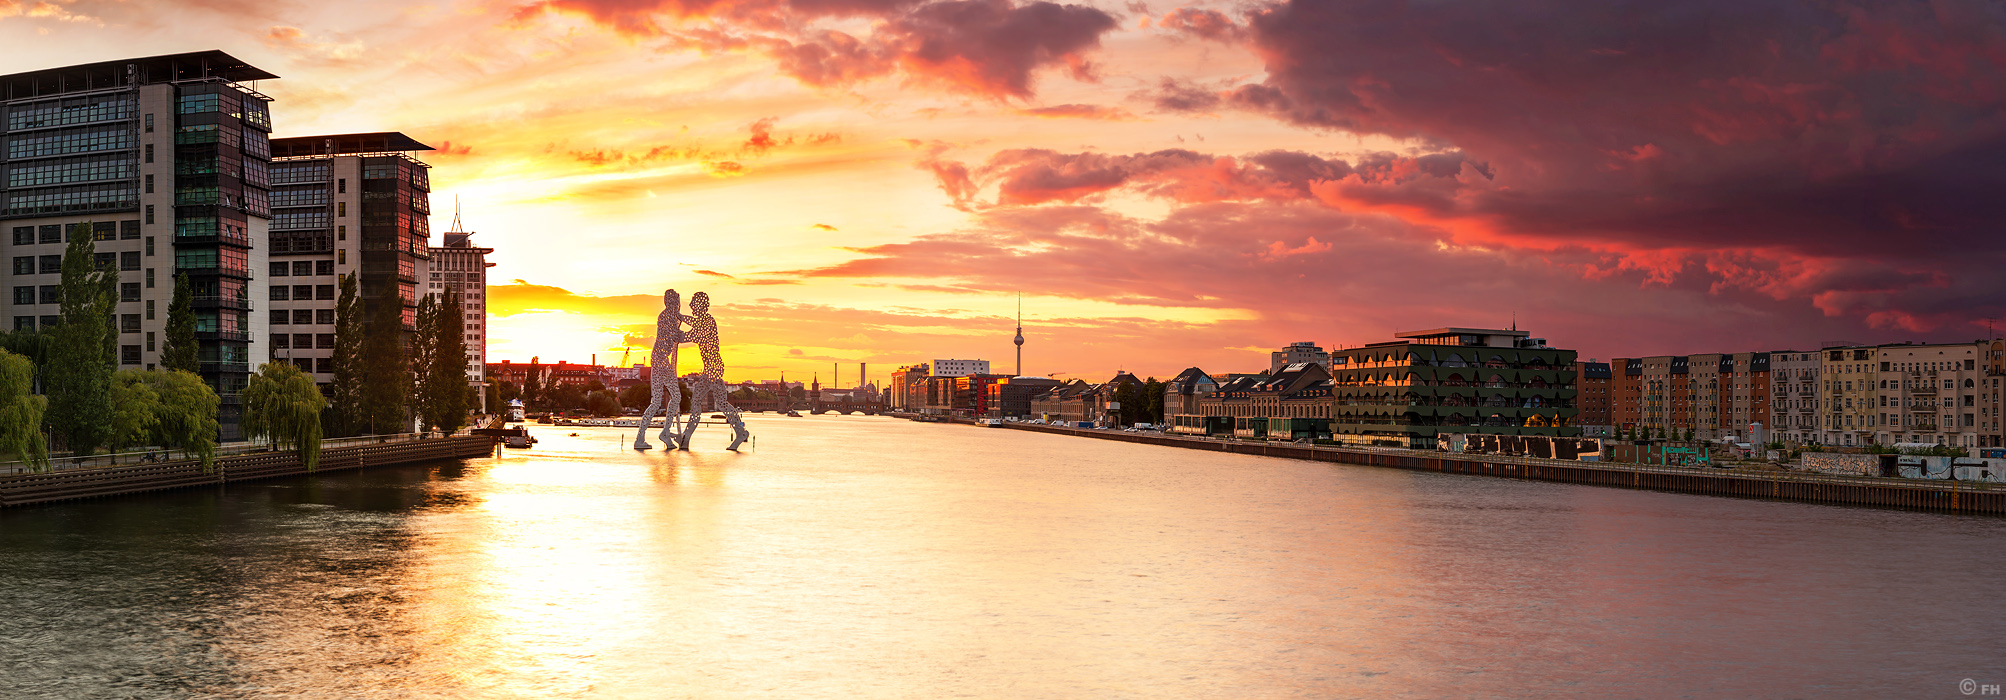 Osthafen_sunset